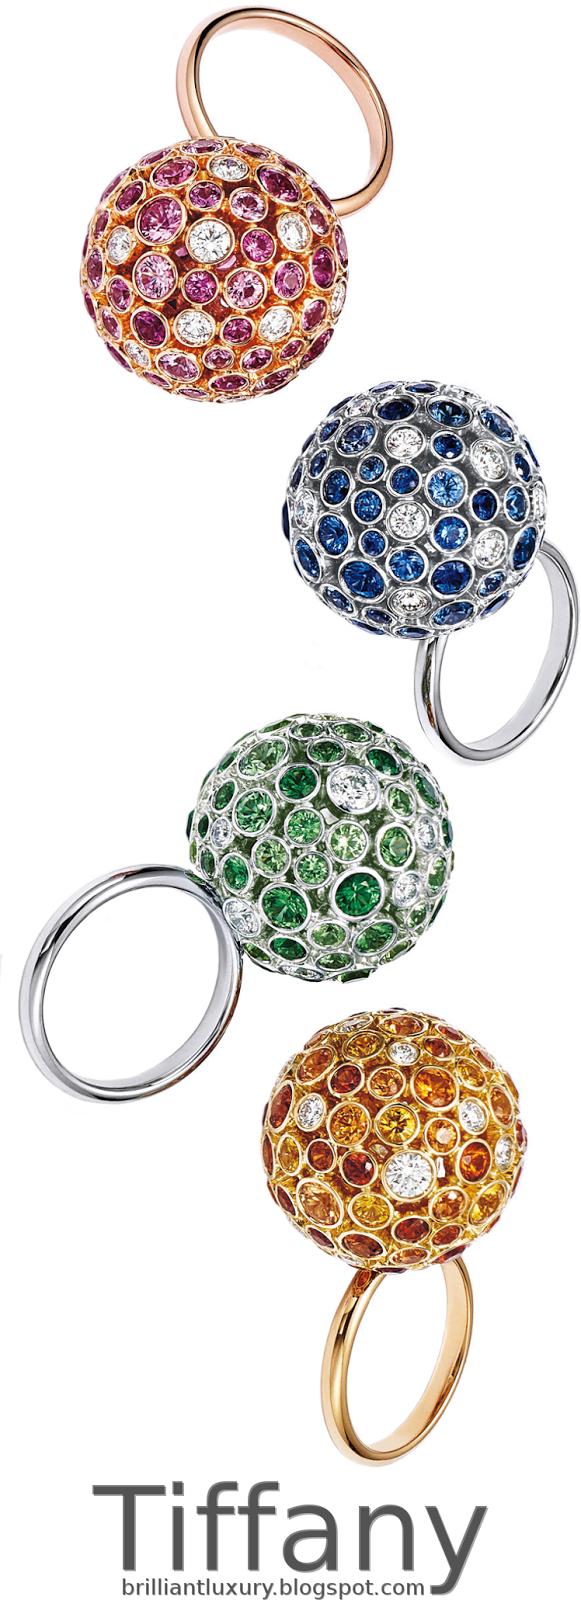 Brilliant Luxury ♦ Tiffany prism orb rings